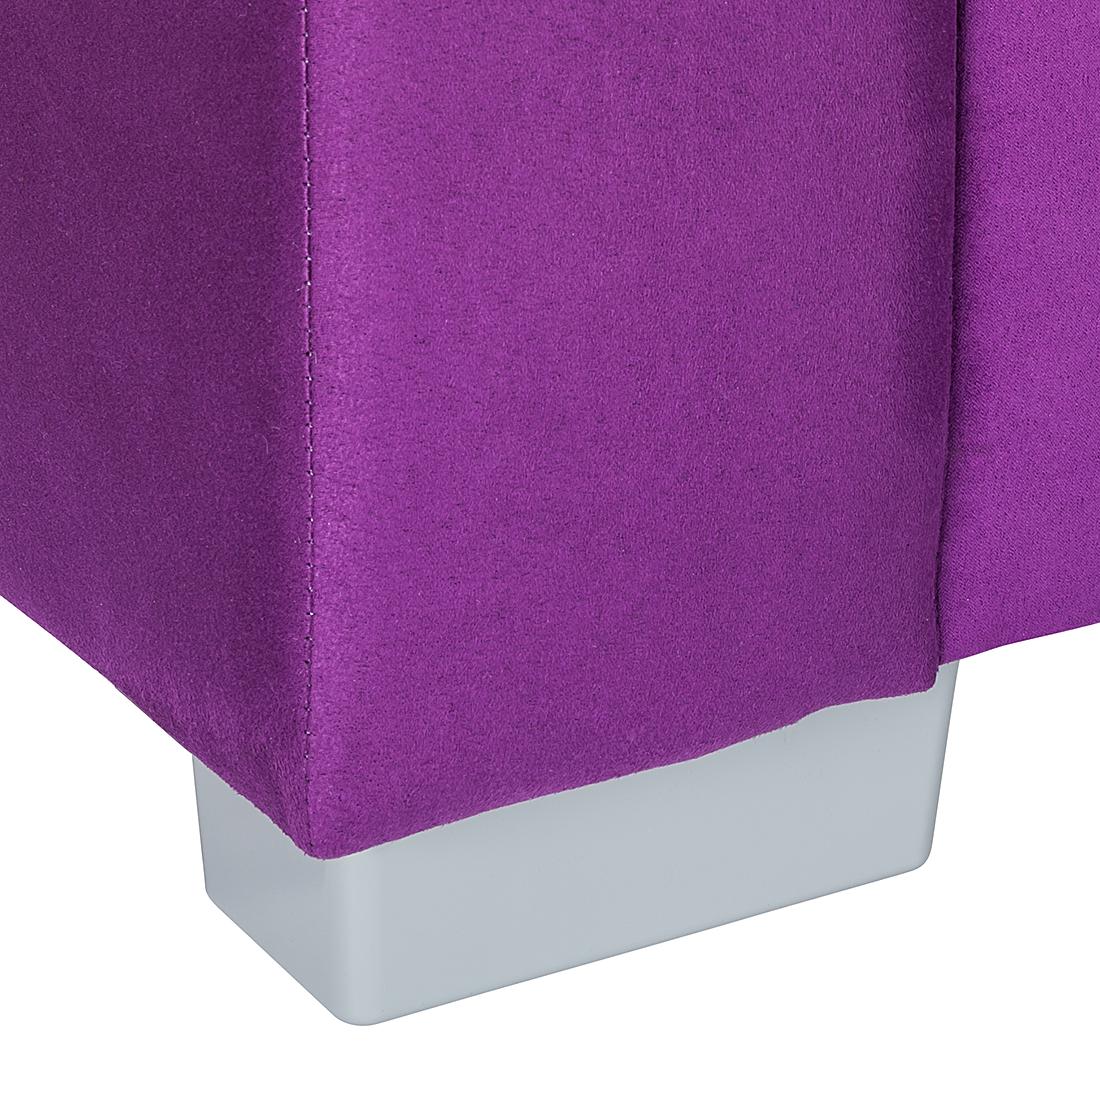 neu ecksofa mit hocker stoff lila wei recamiere rechts. Black Bedroom Furniture Sets. Home Design Ideas